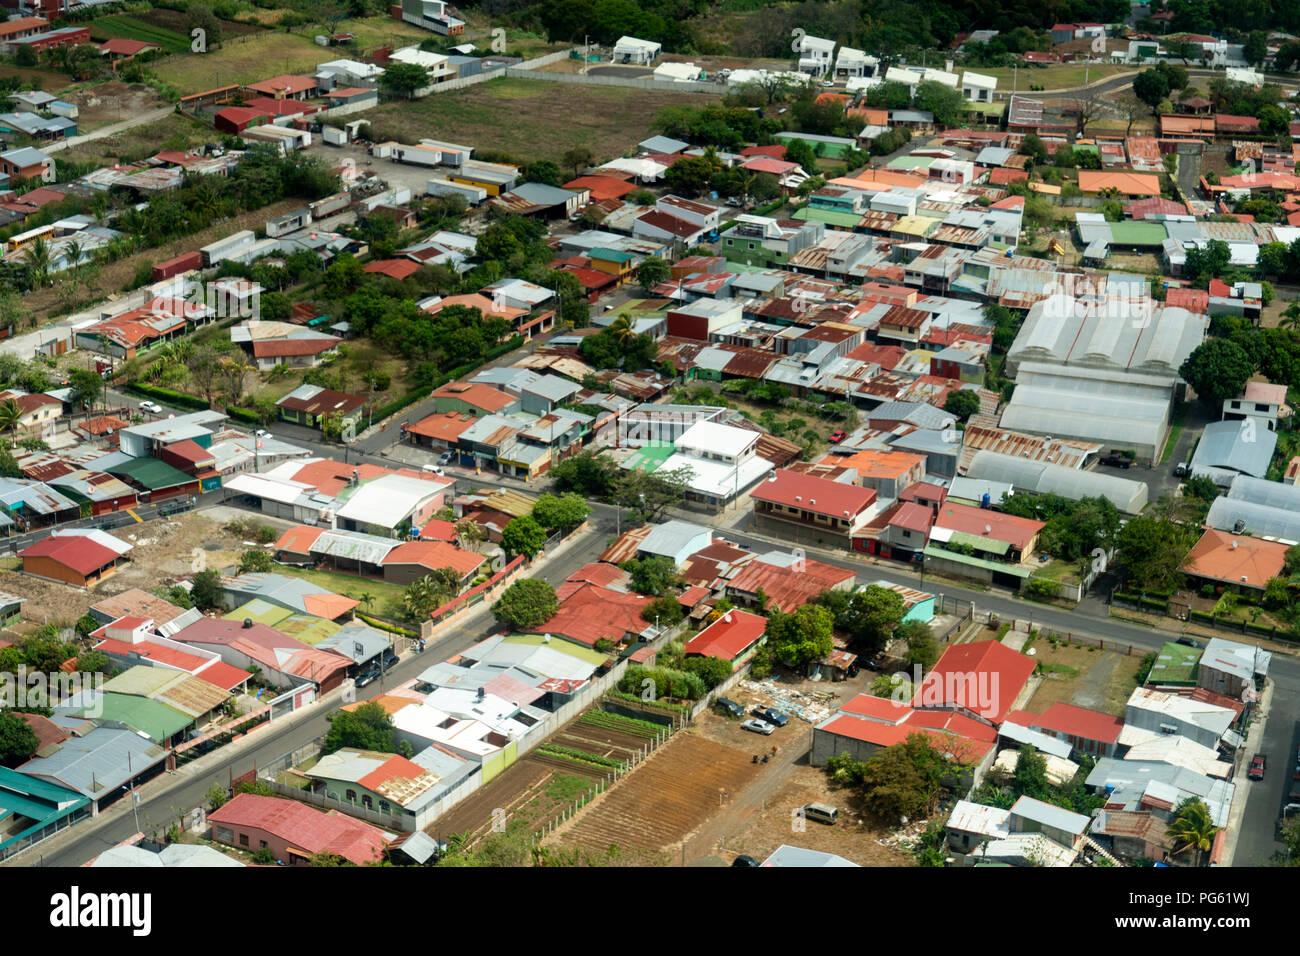 Aerial - San Jose, Costa Rica Photo Stock